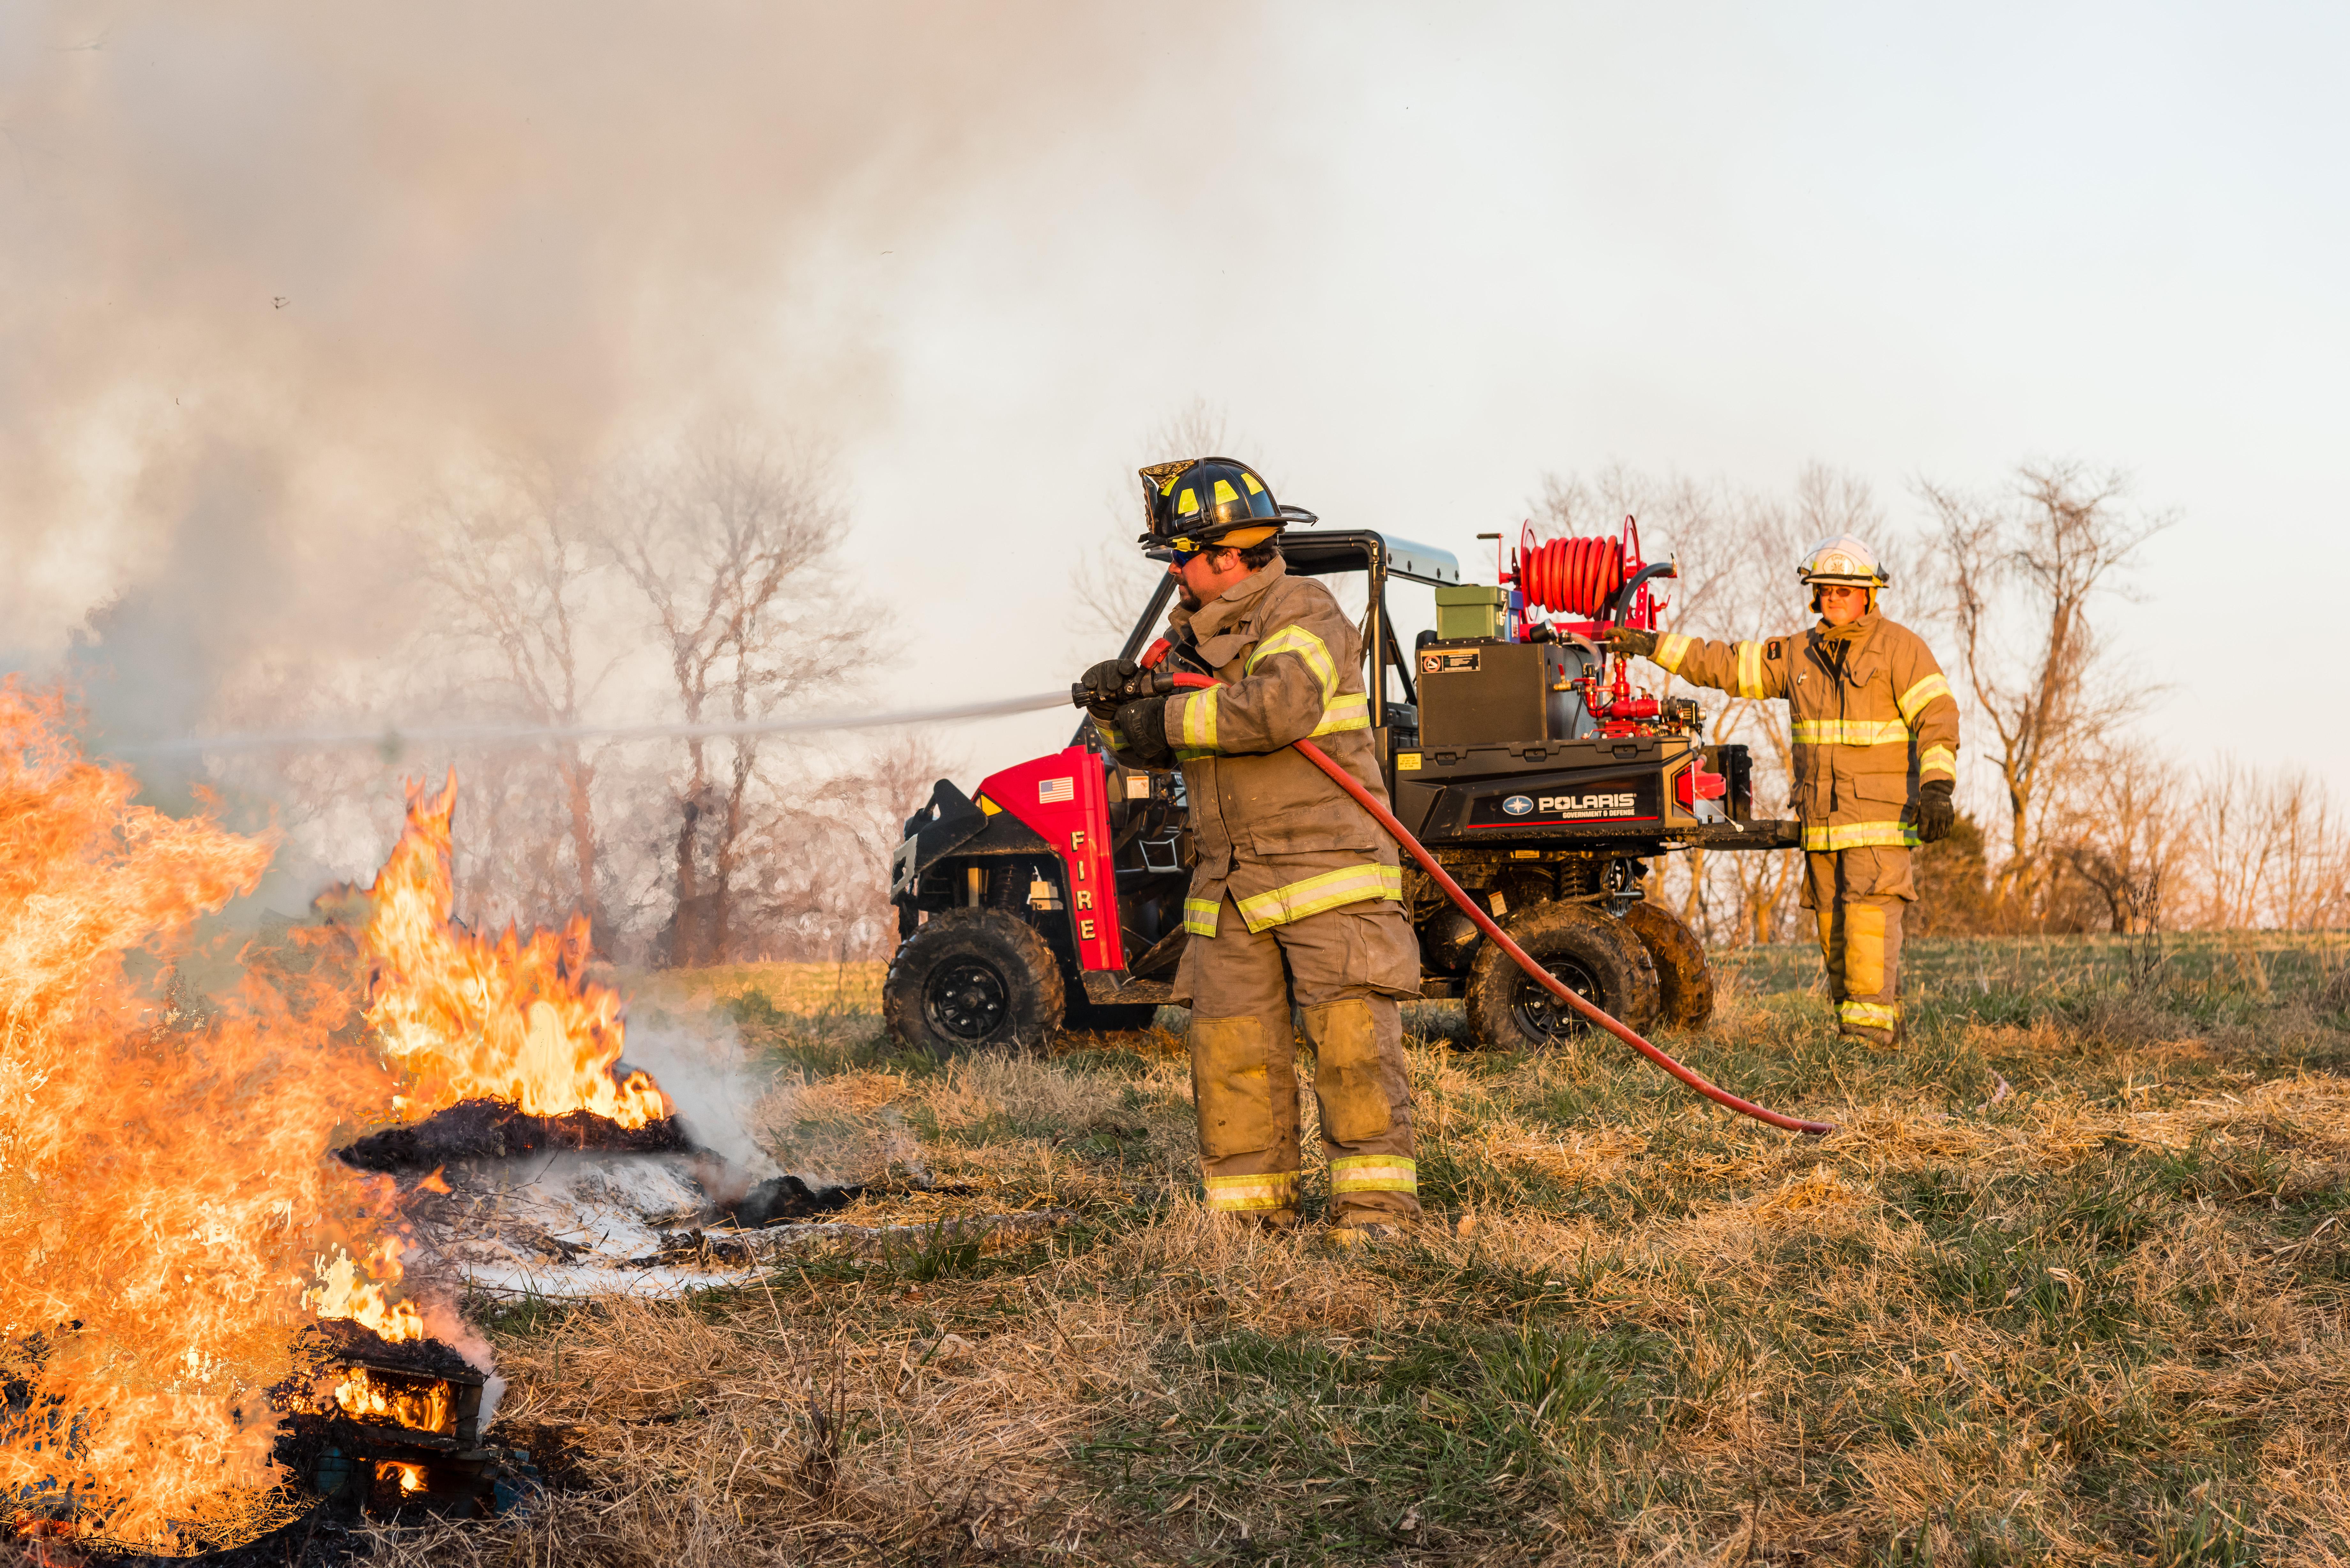 Polaris Government and Defense - Ranger Fire